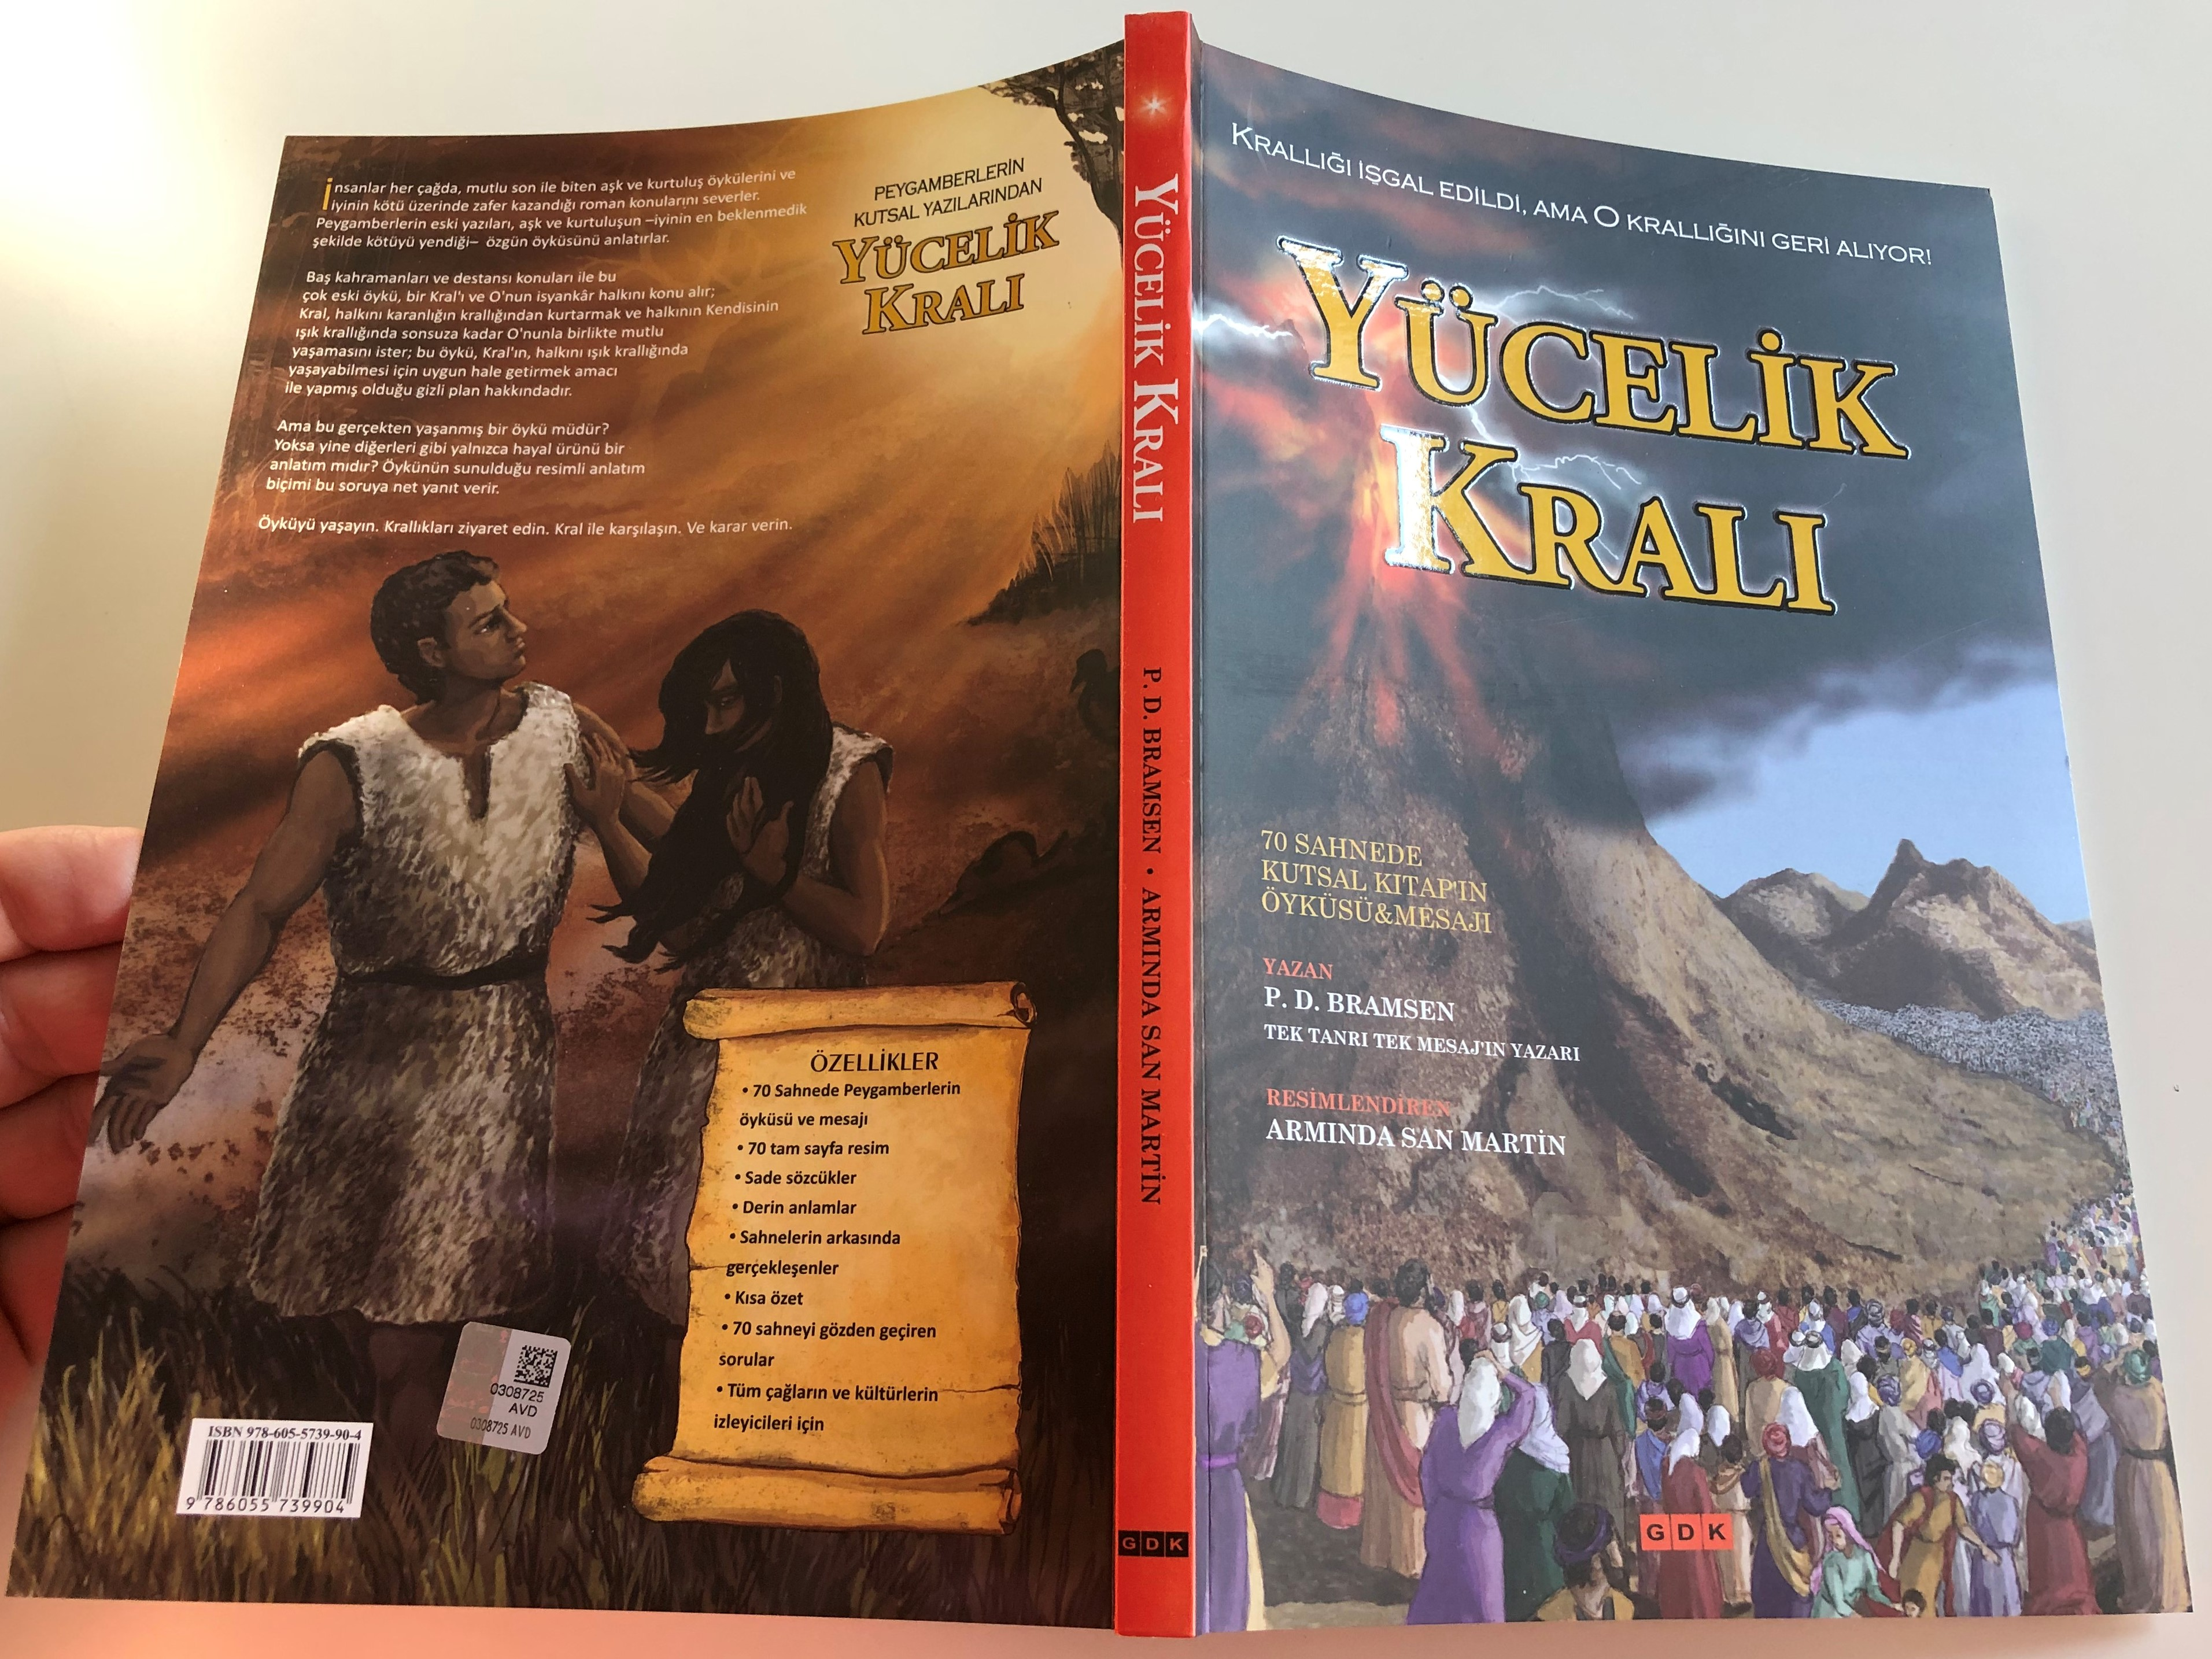 y-celik-krali-king-of-glory-70-bible-stories-for-children-turkish-language-edition-by-p.-d.-bramsen-16.jpg